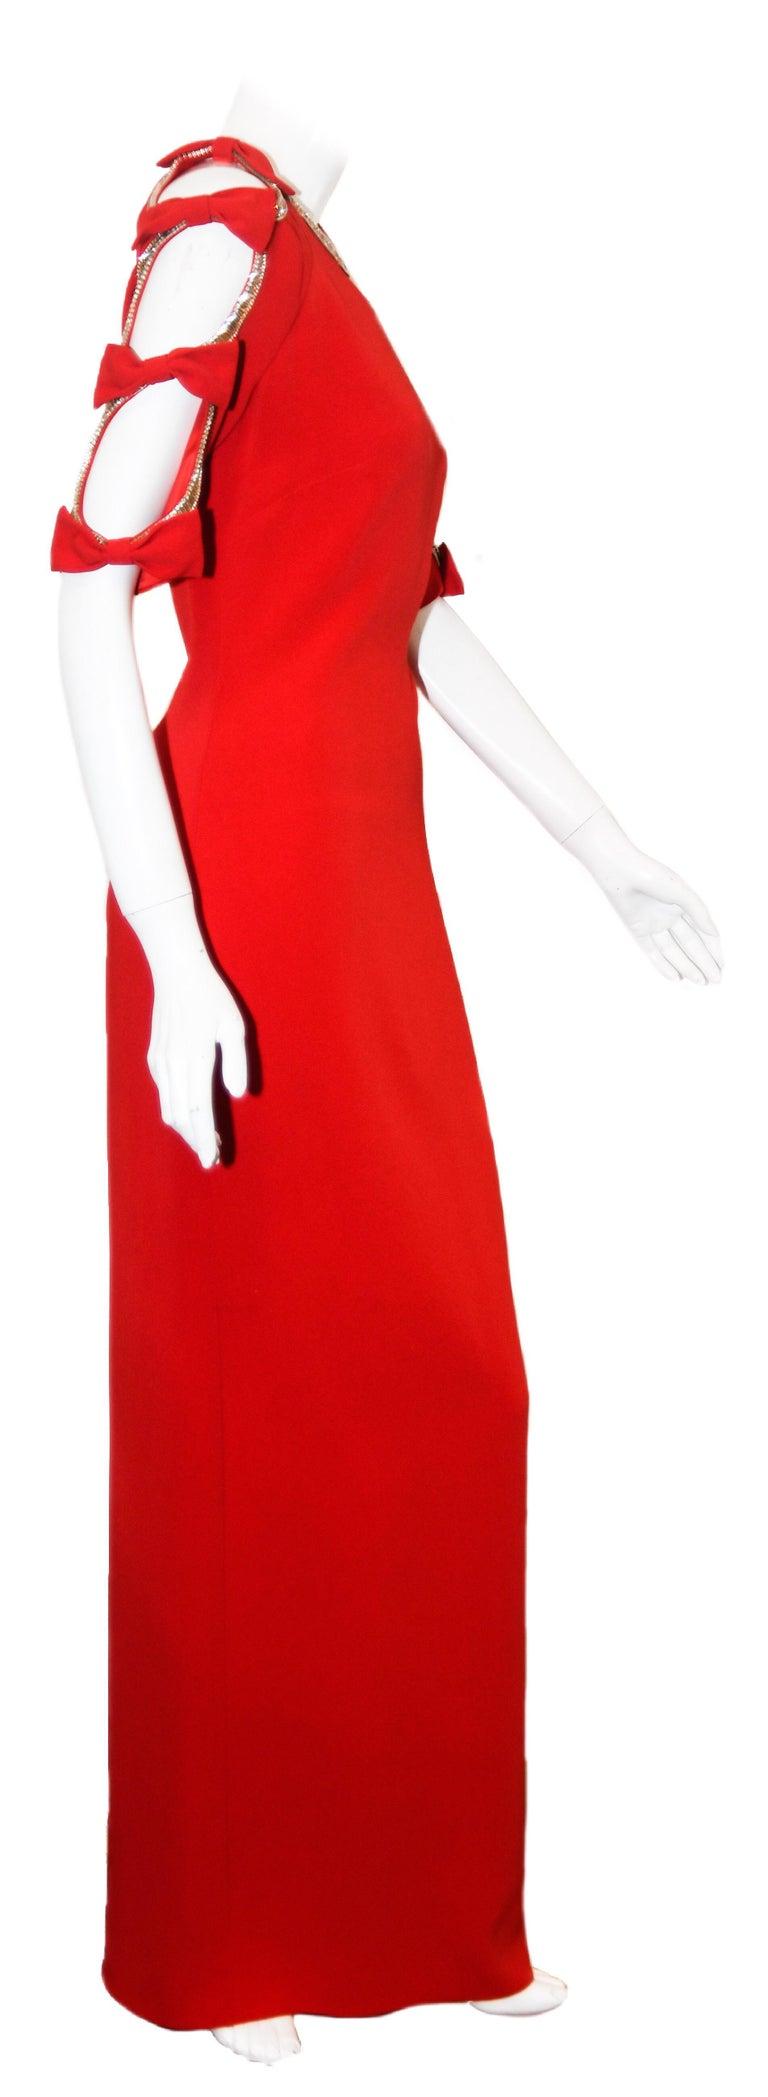 Jenny Packham Red Gown W/ Cold Shoulder Embellished Sleeves For Sale 1